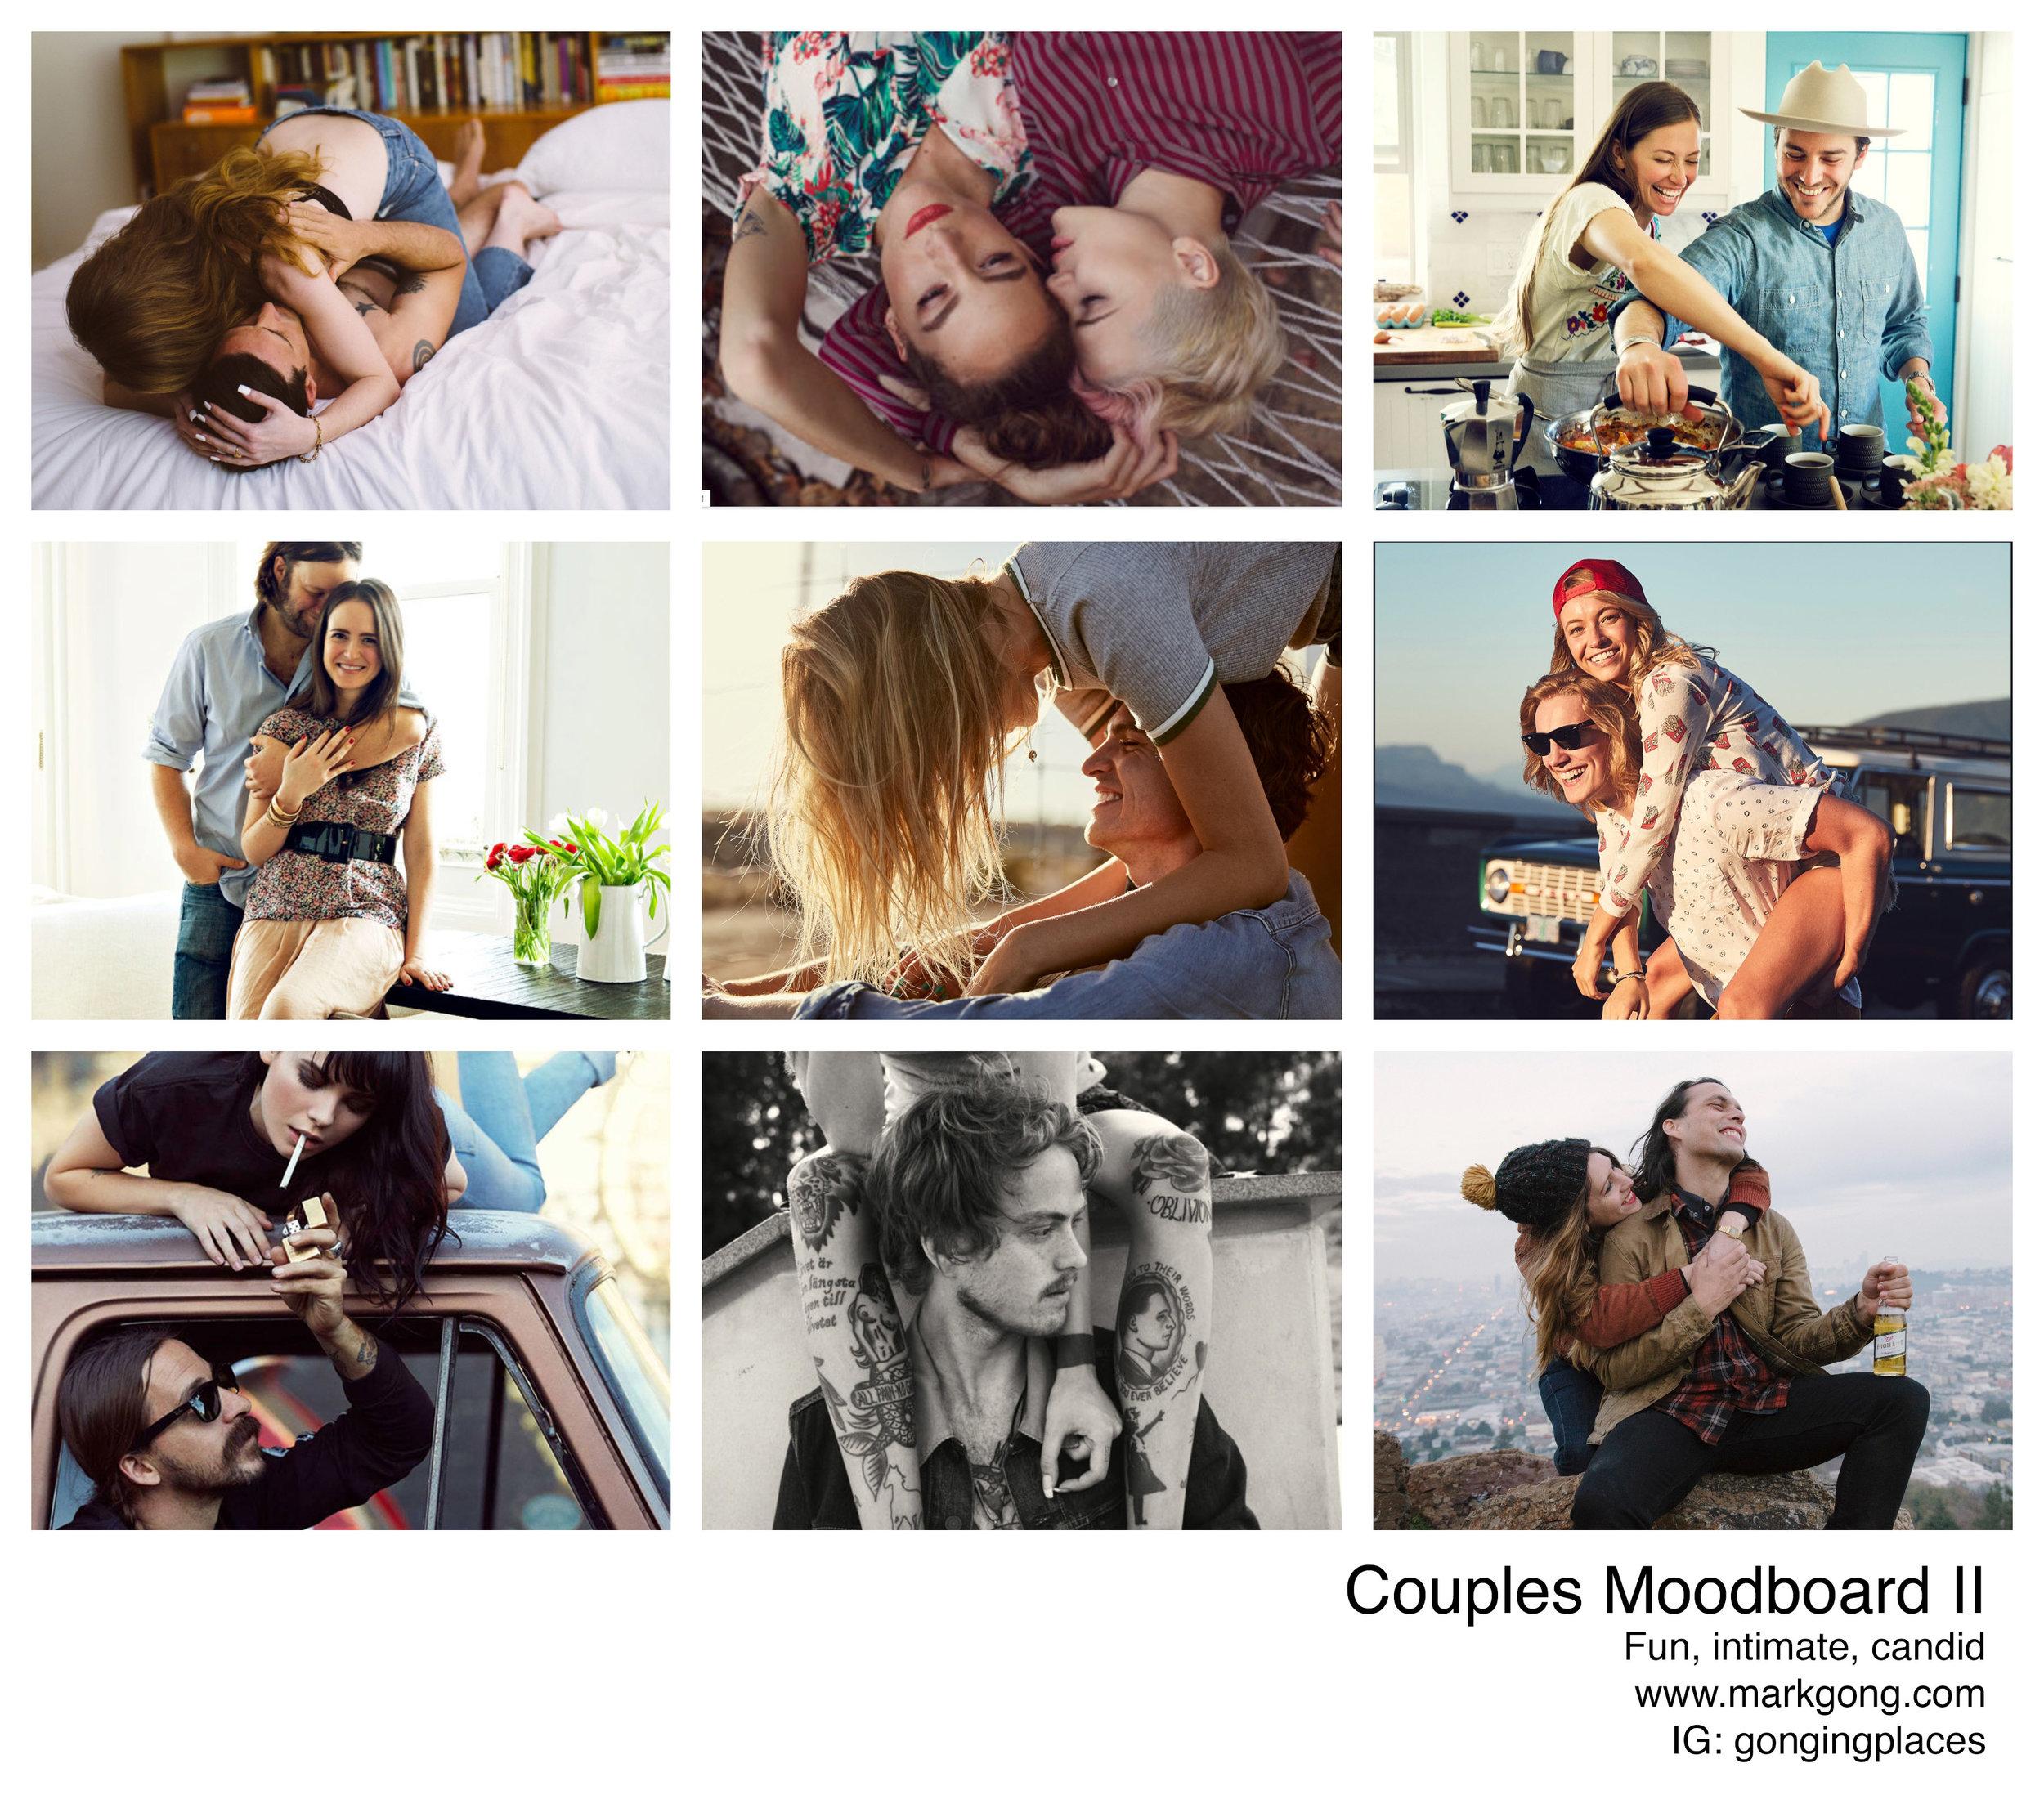 LA-Couples 2.JPG